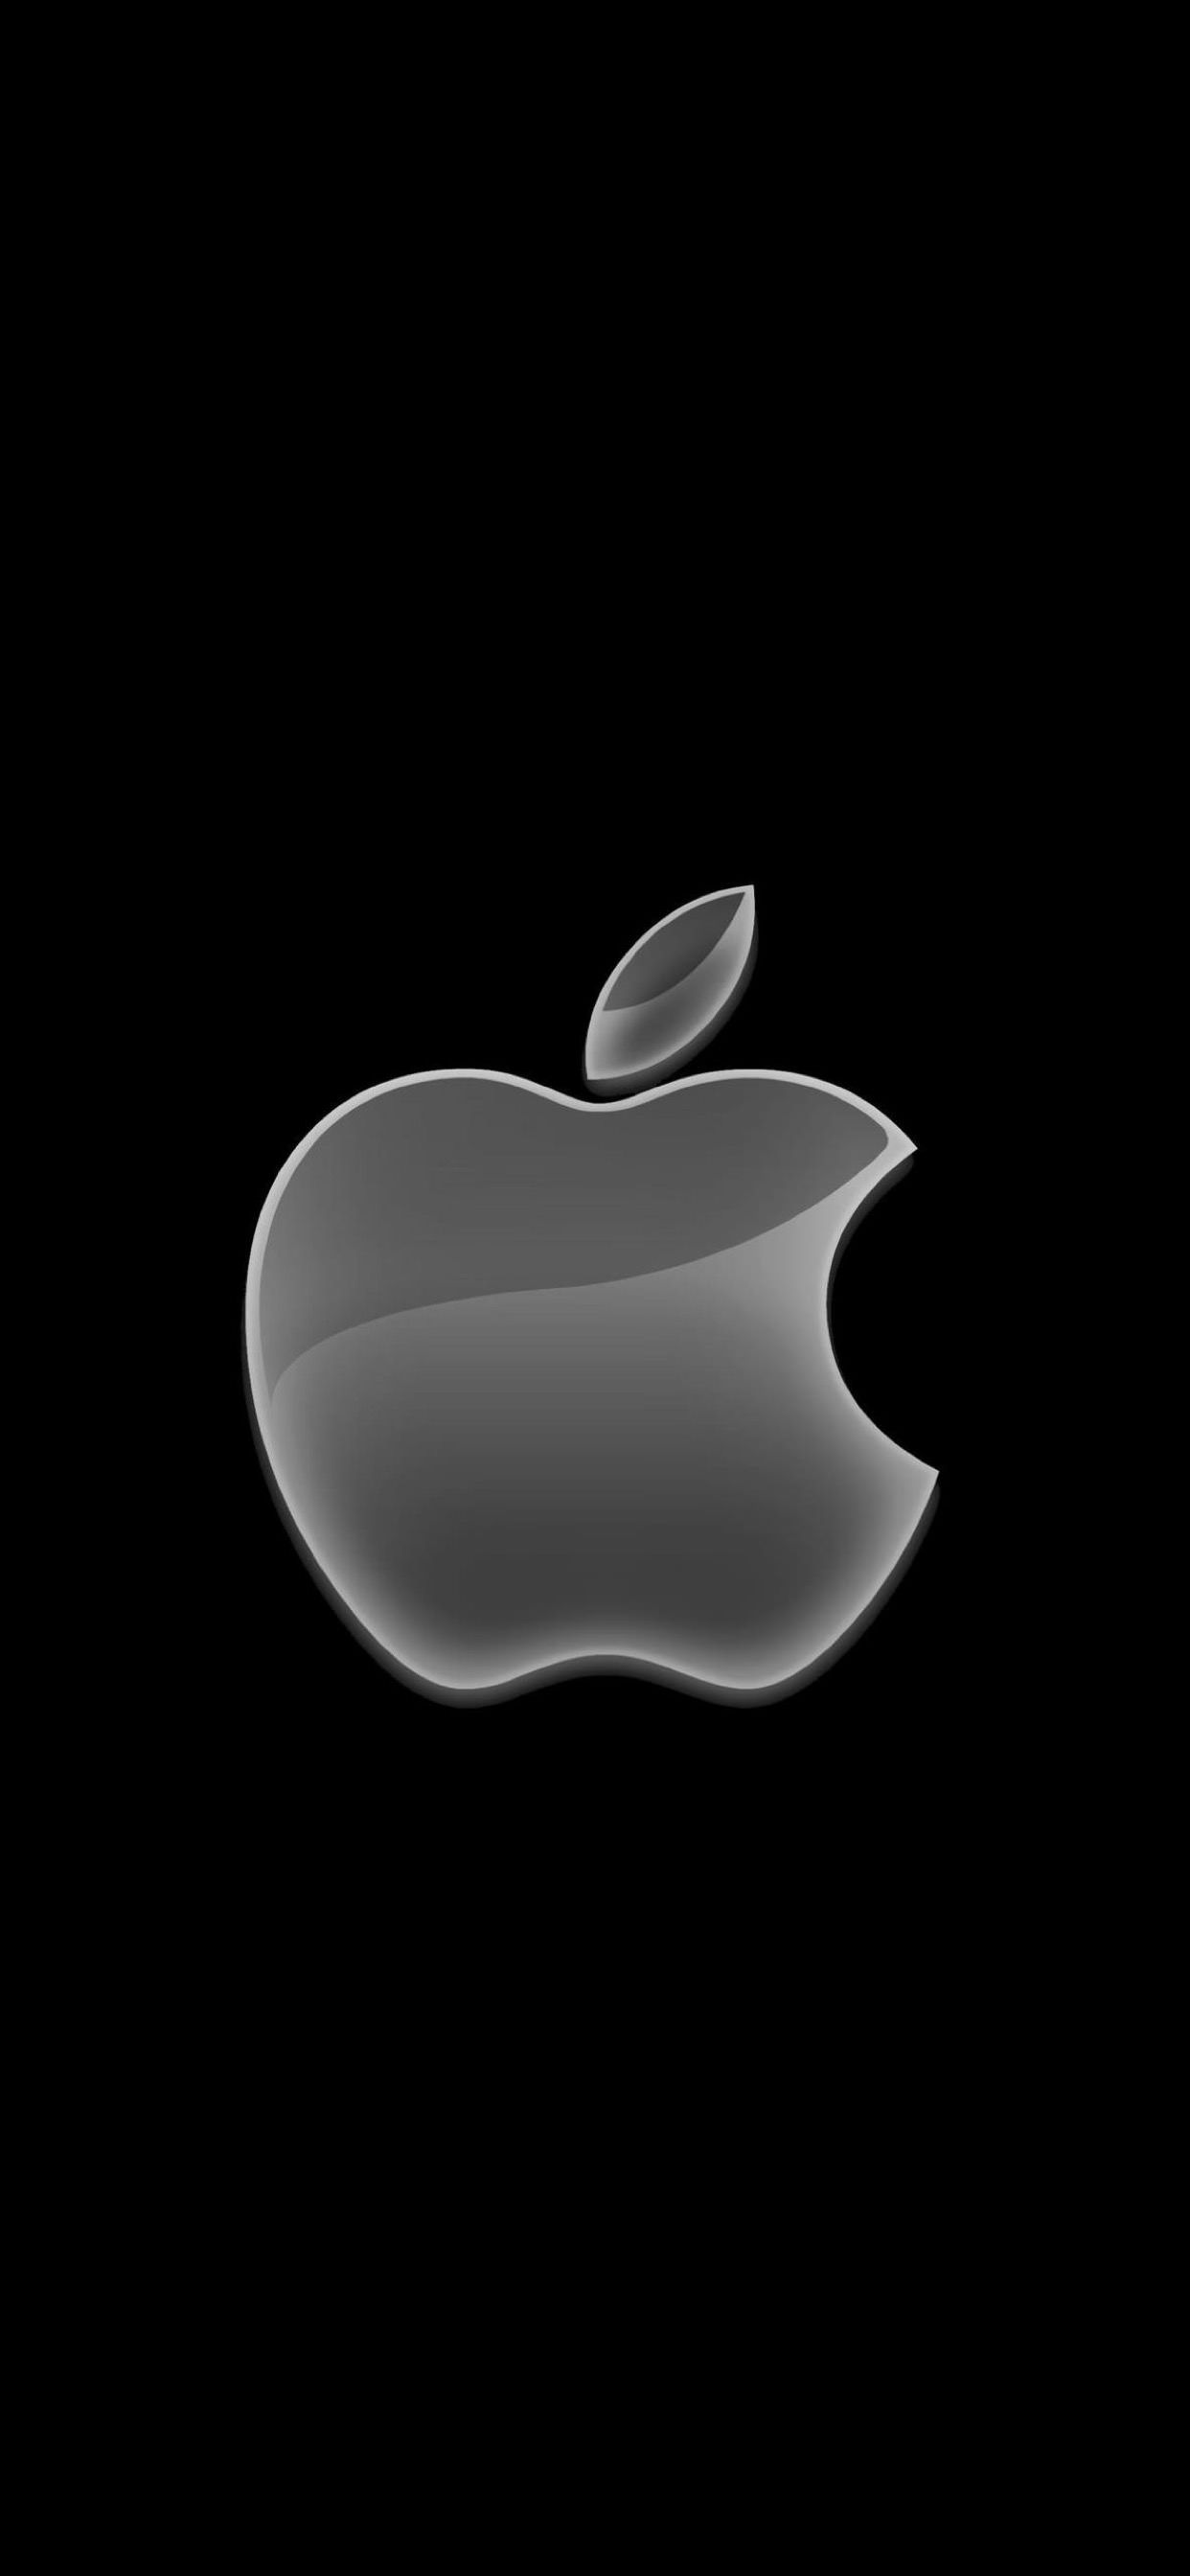 Download Iphone Xs Max Wallpaper Apple Logo Cikimmcom Apple 1242x2688